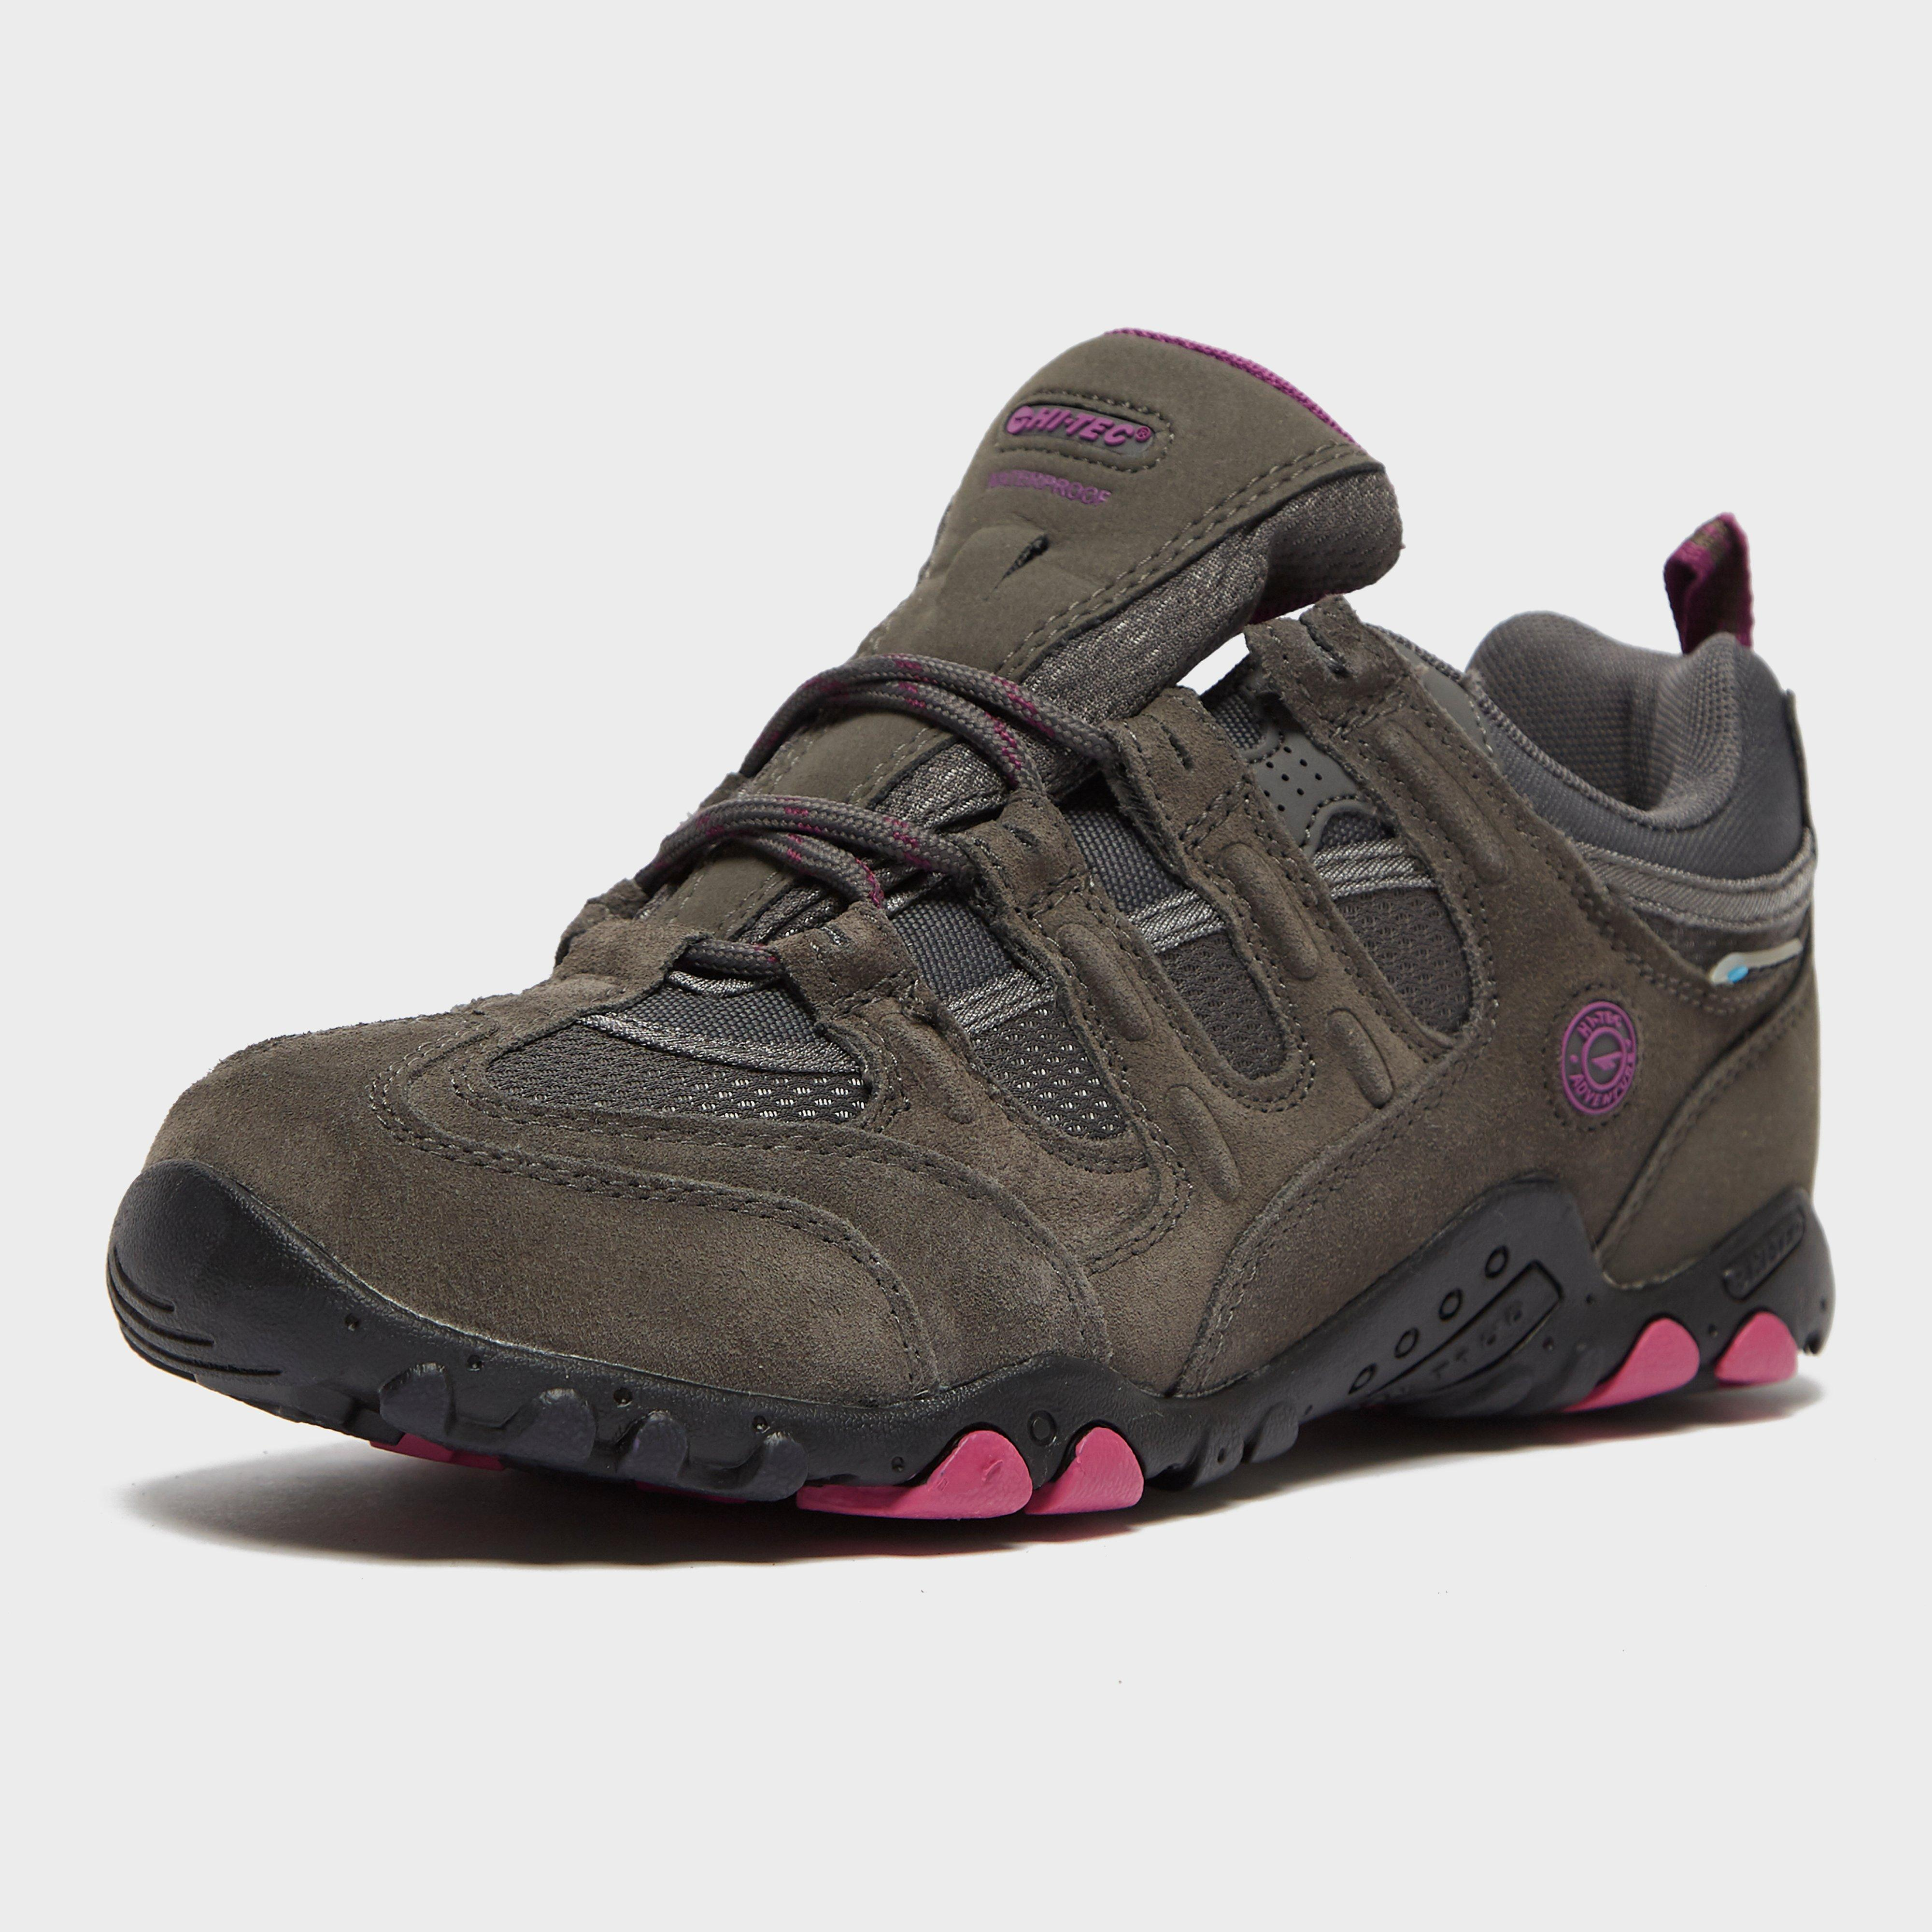 Hi-Tec Womens Quadra Classic Walking Shoes Brown Sports Breathable Trainers